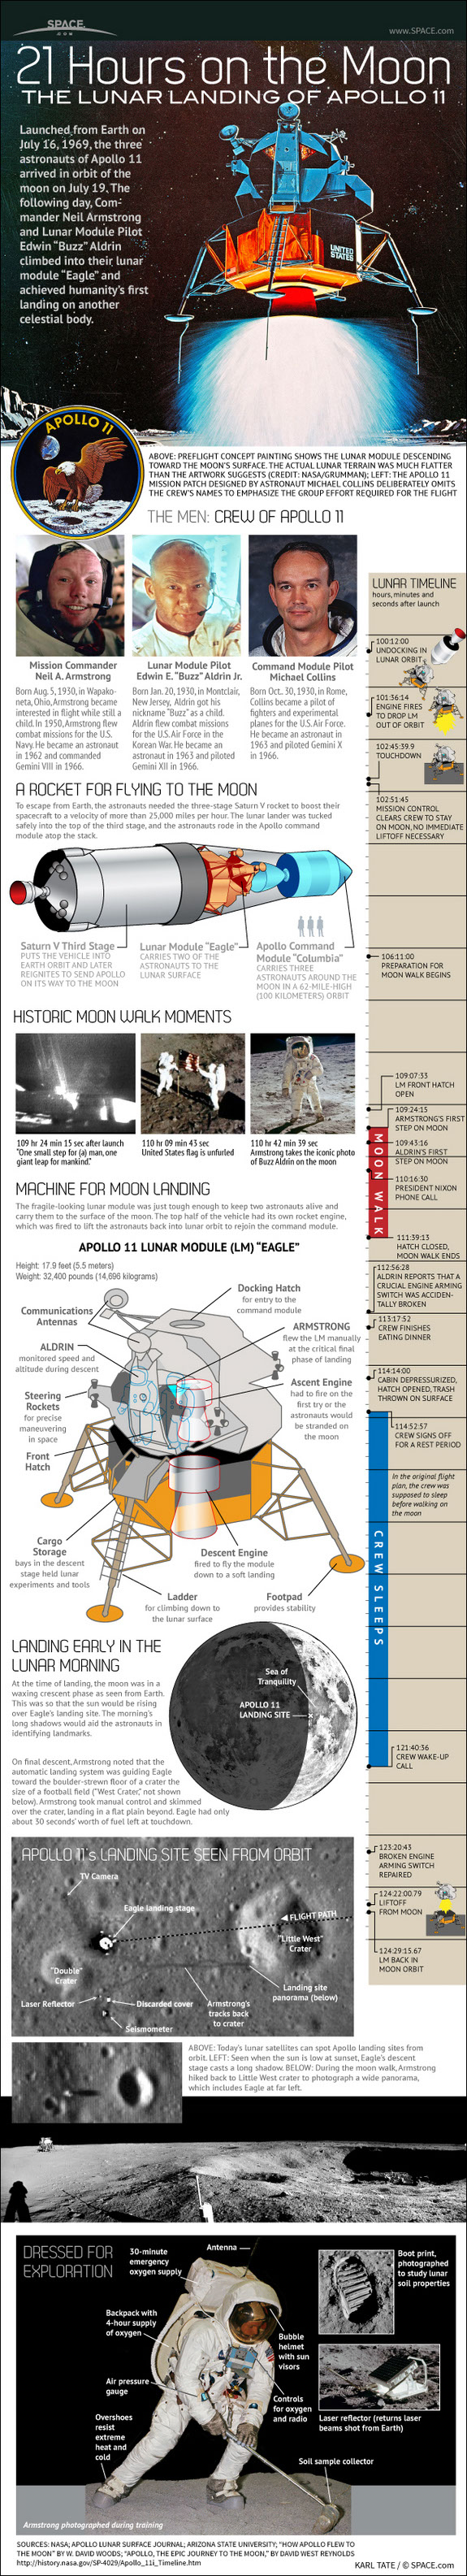 Apollo 11 Lunar Landing-infographic